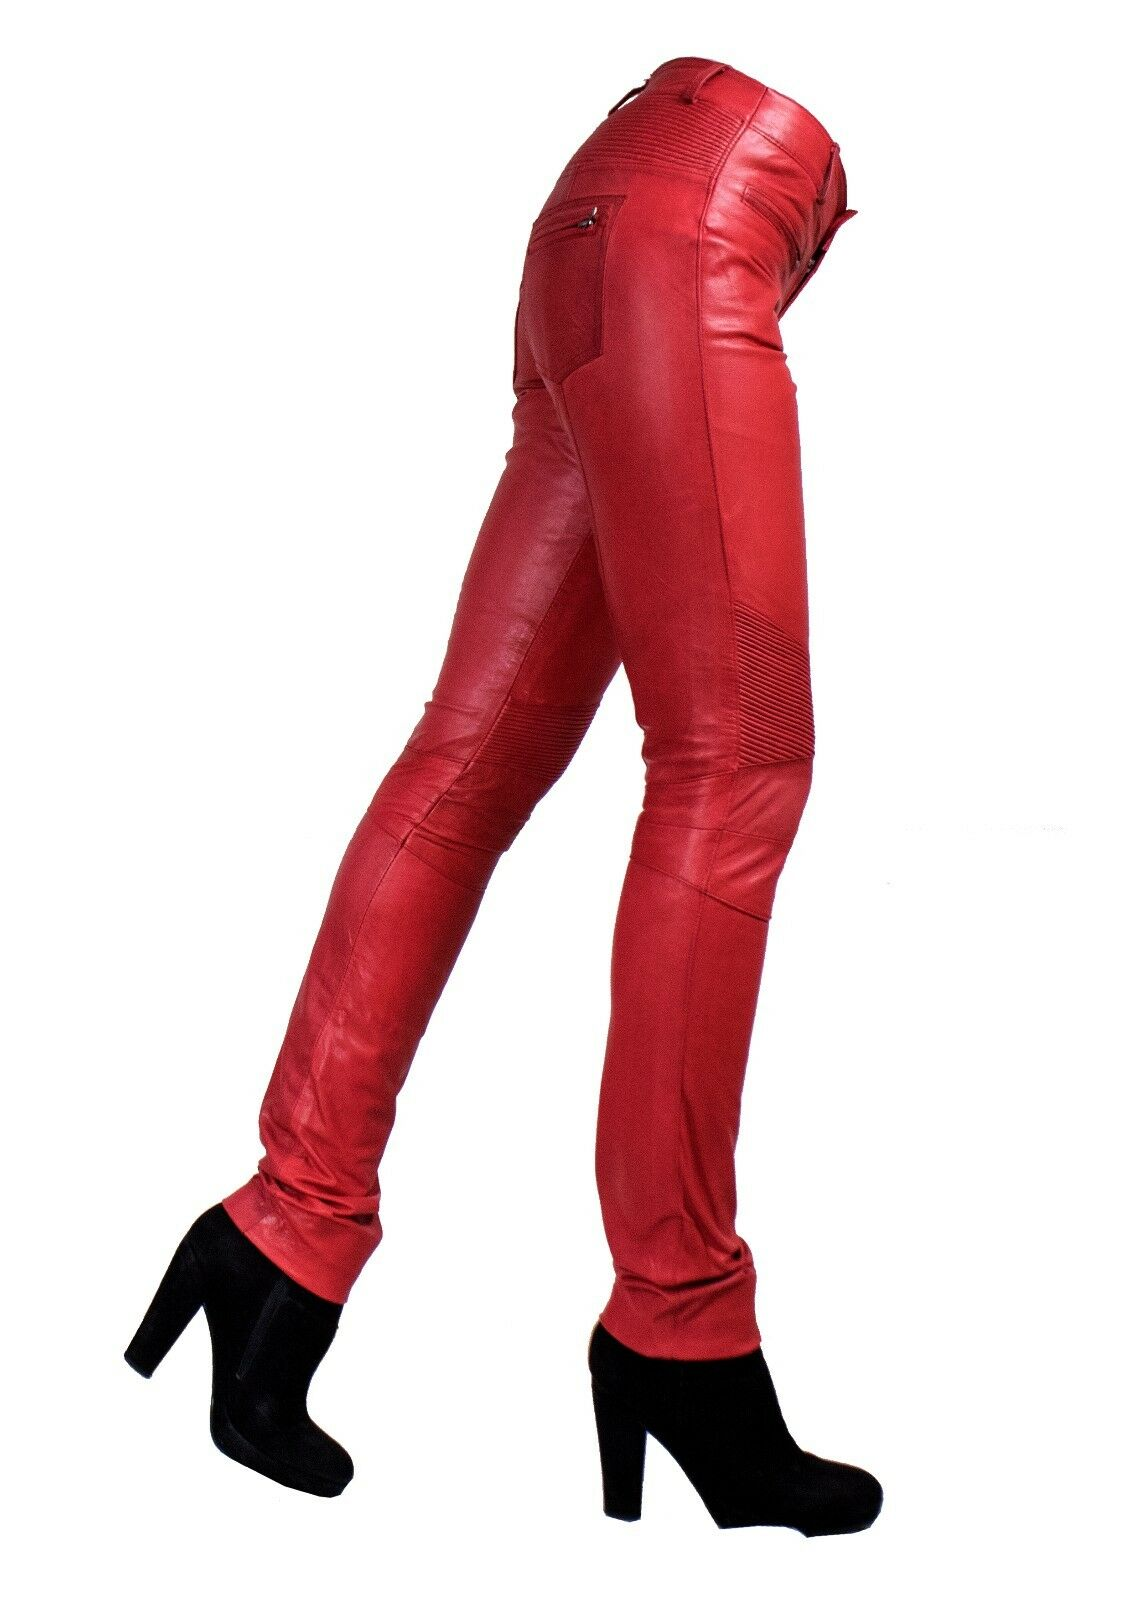 """Yonna"" Damen Lederhose aus echtem Lamm Nappa Leder in Rot"